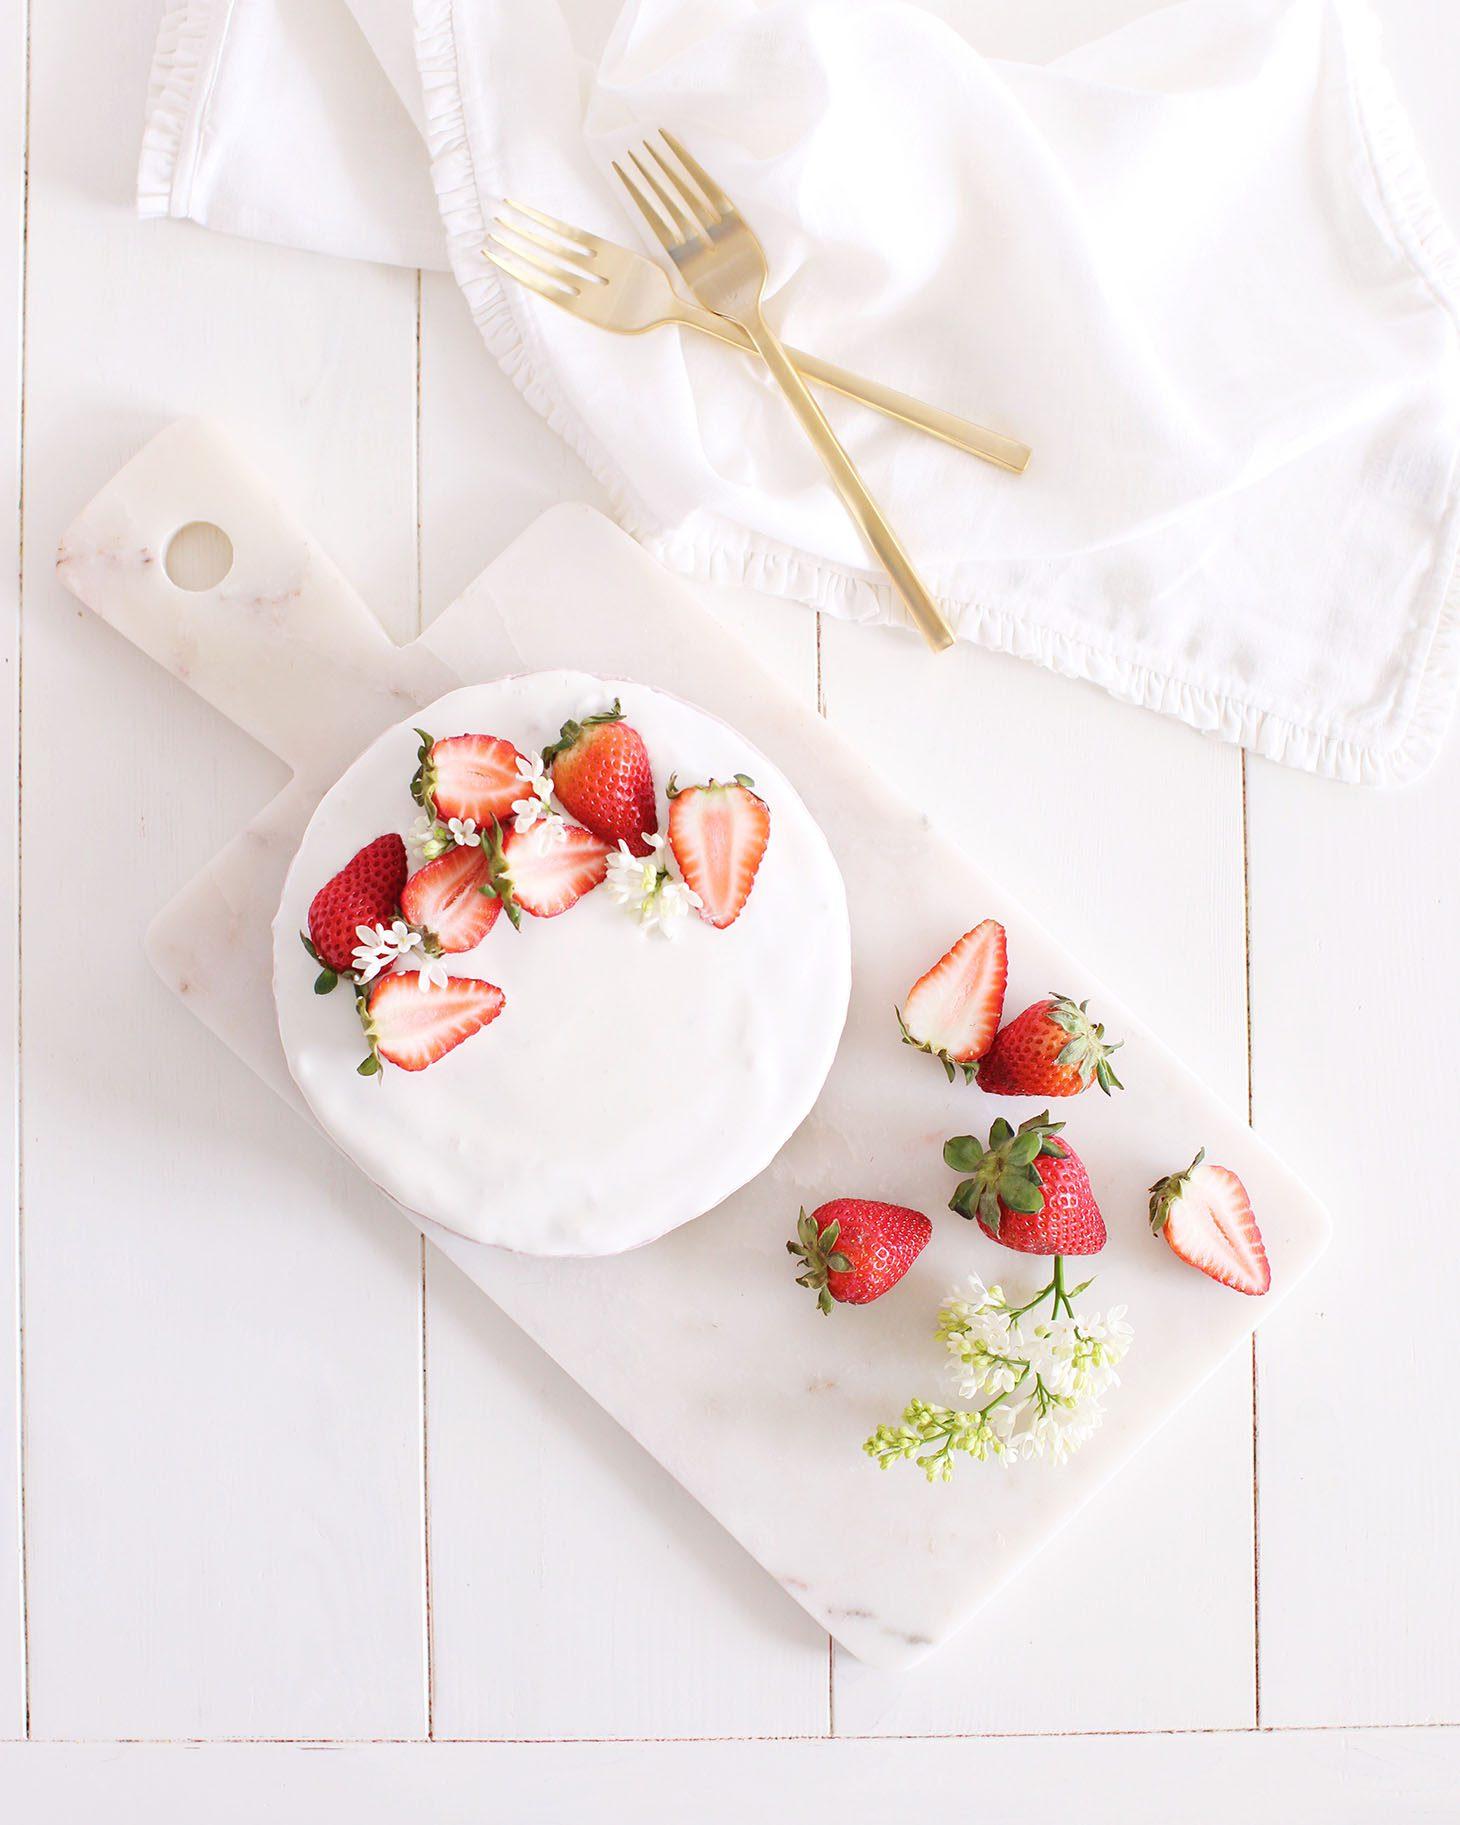 Jillian Harris Vegan Coconut Strawberry Cheesecake on marble cutting board with cut up strawberries.